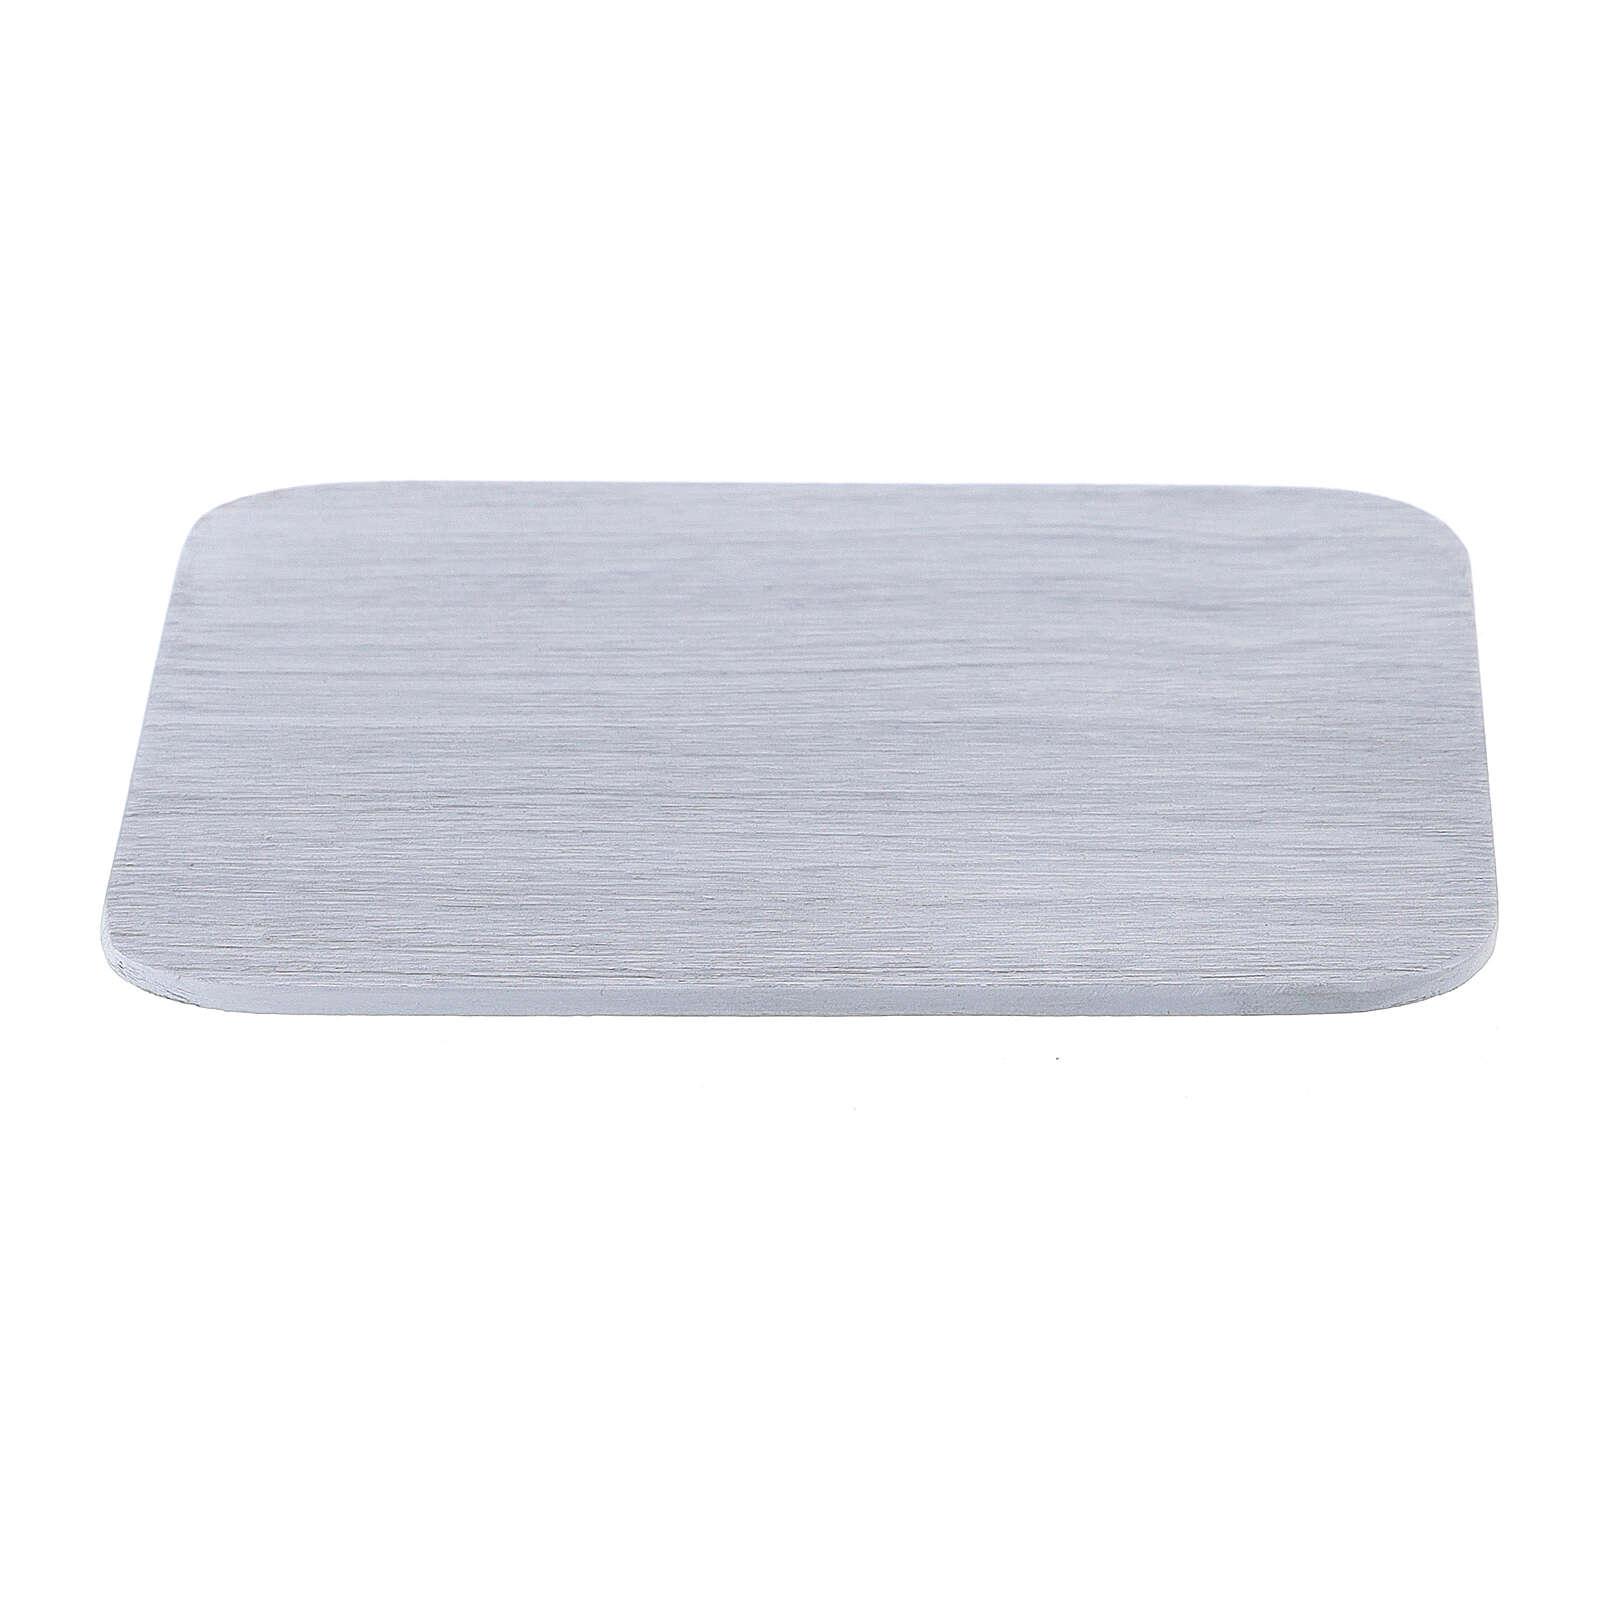 Prato quadrado alumínio branco escovado 10x10 cm 3